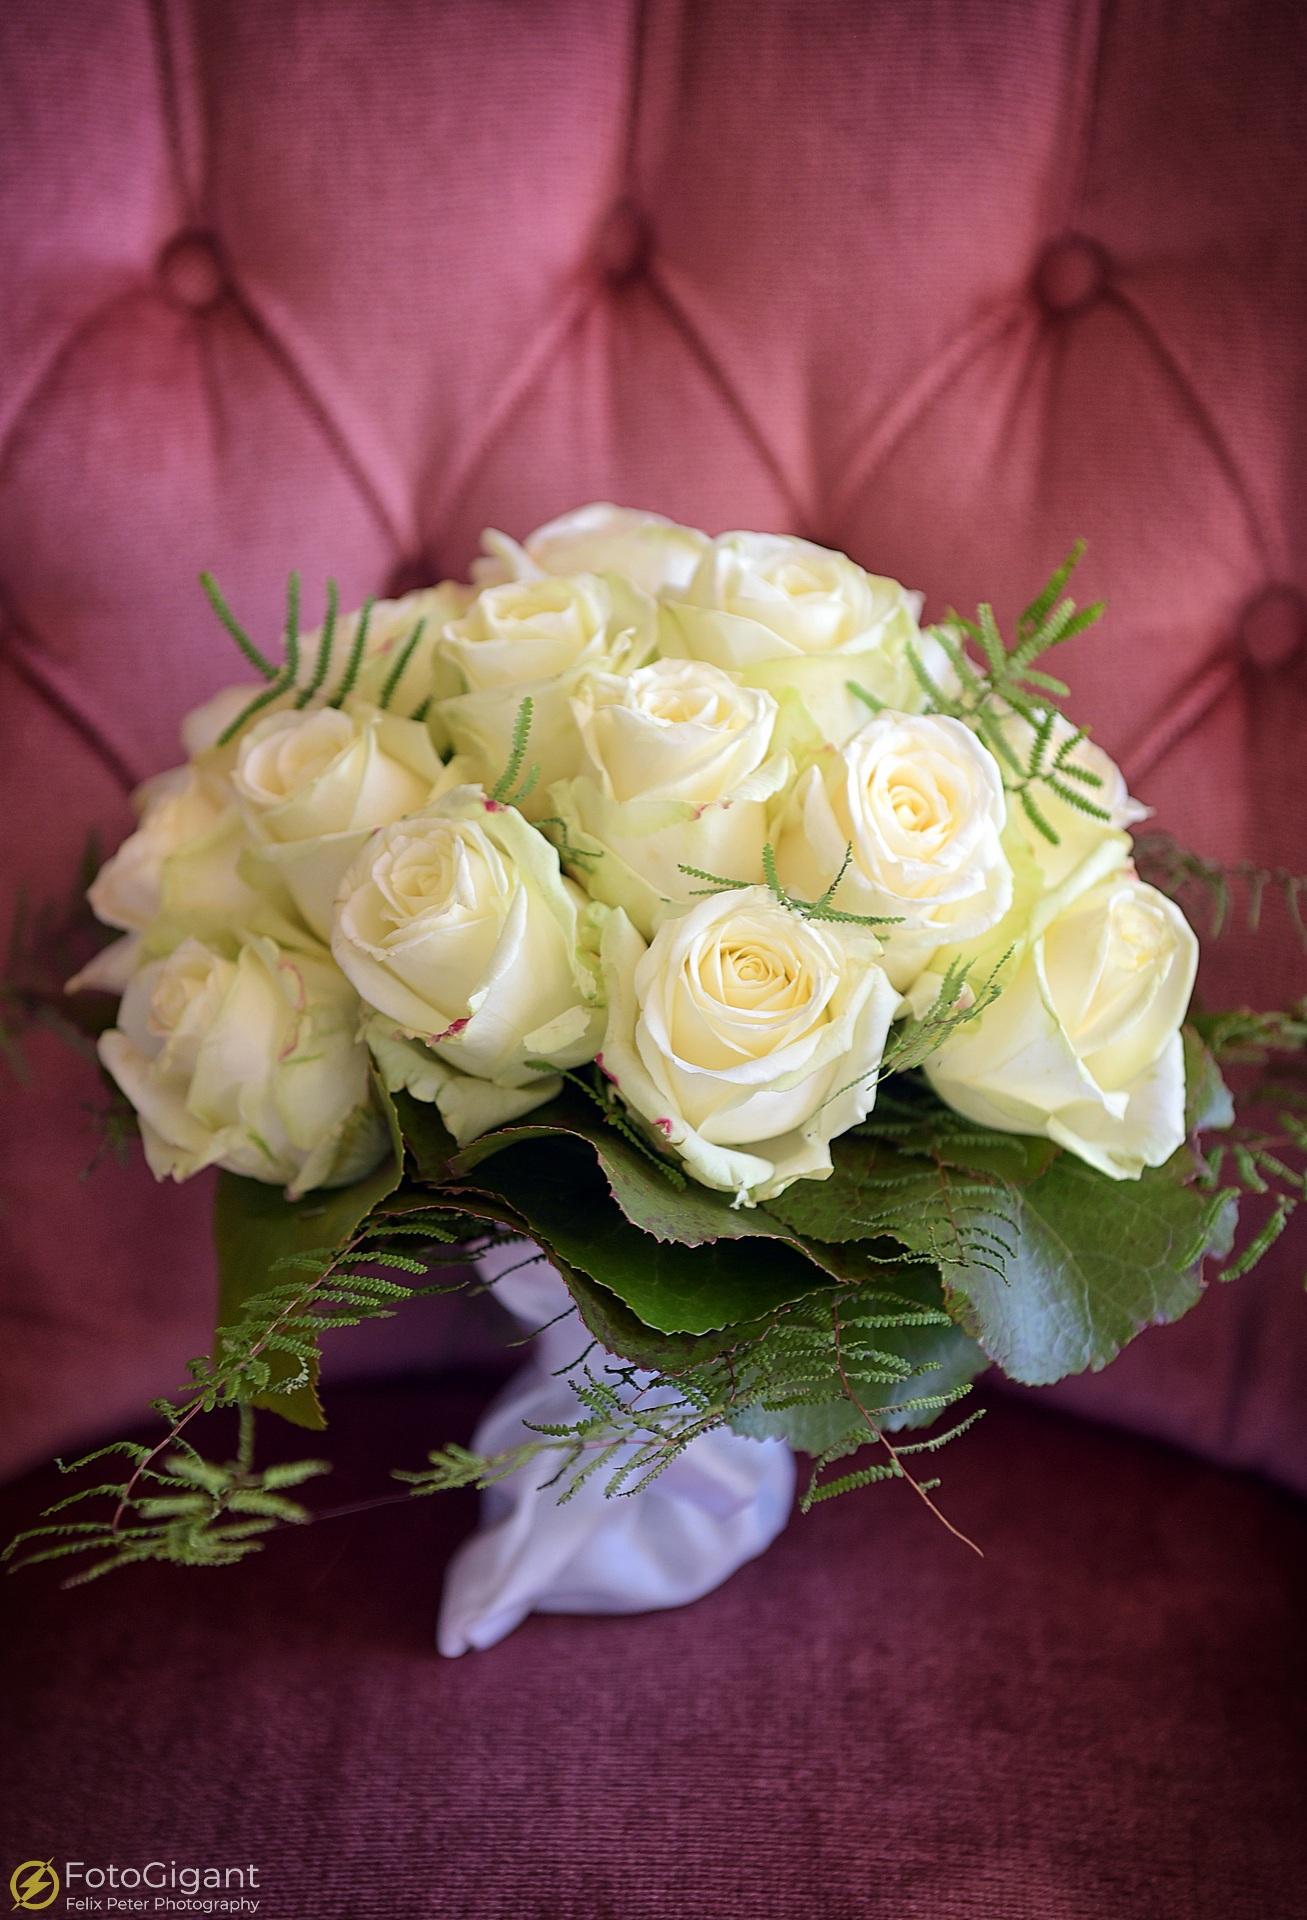 Hochzeitsfotografiekurs_Fotograf_Felix_Peter_02.jpg